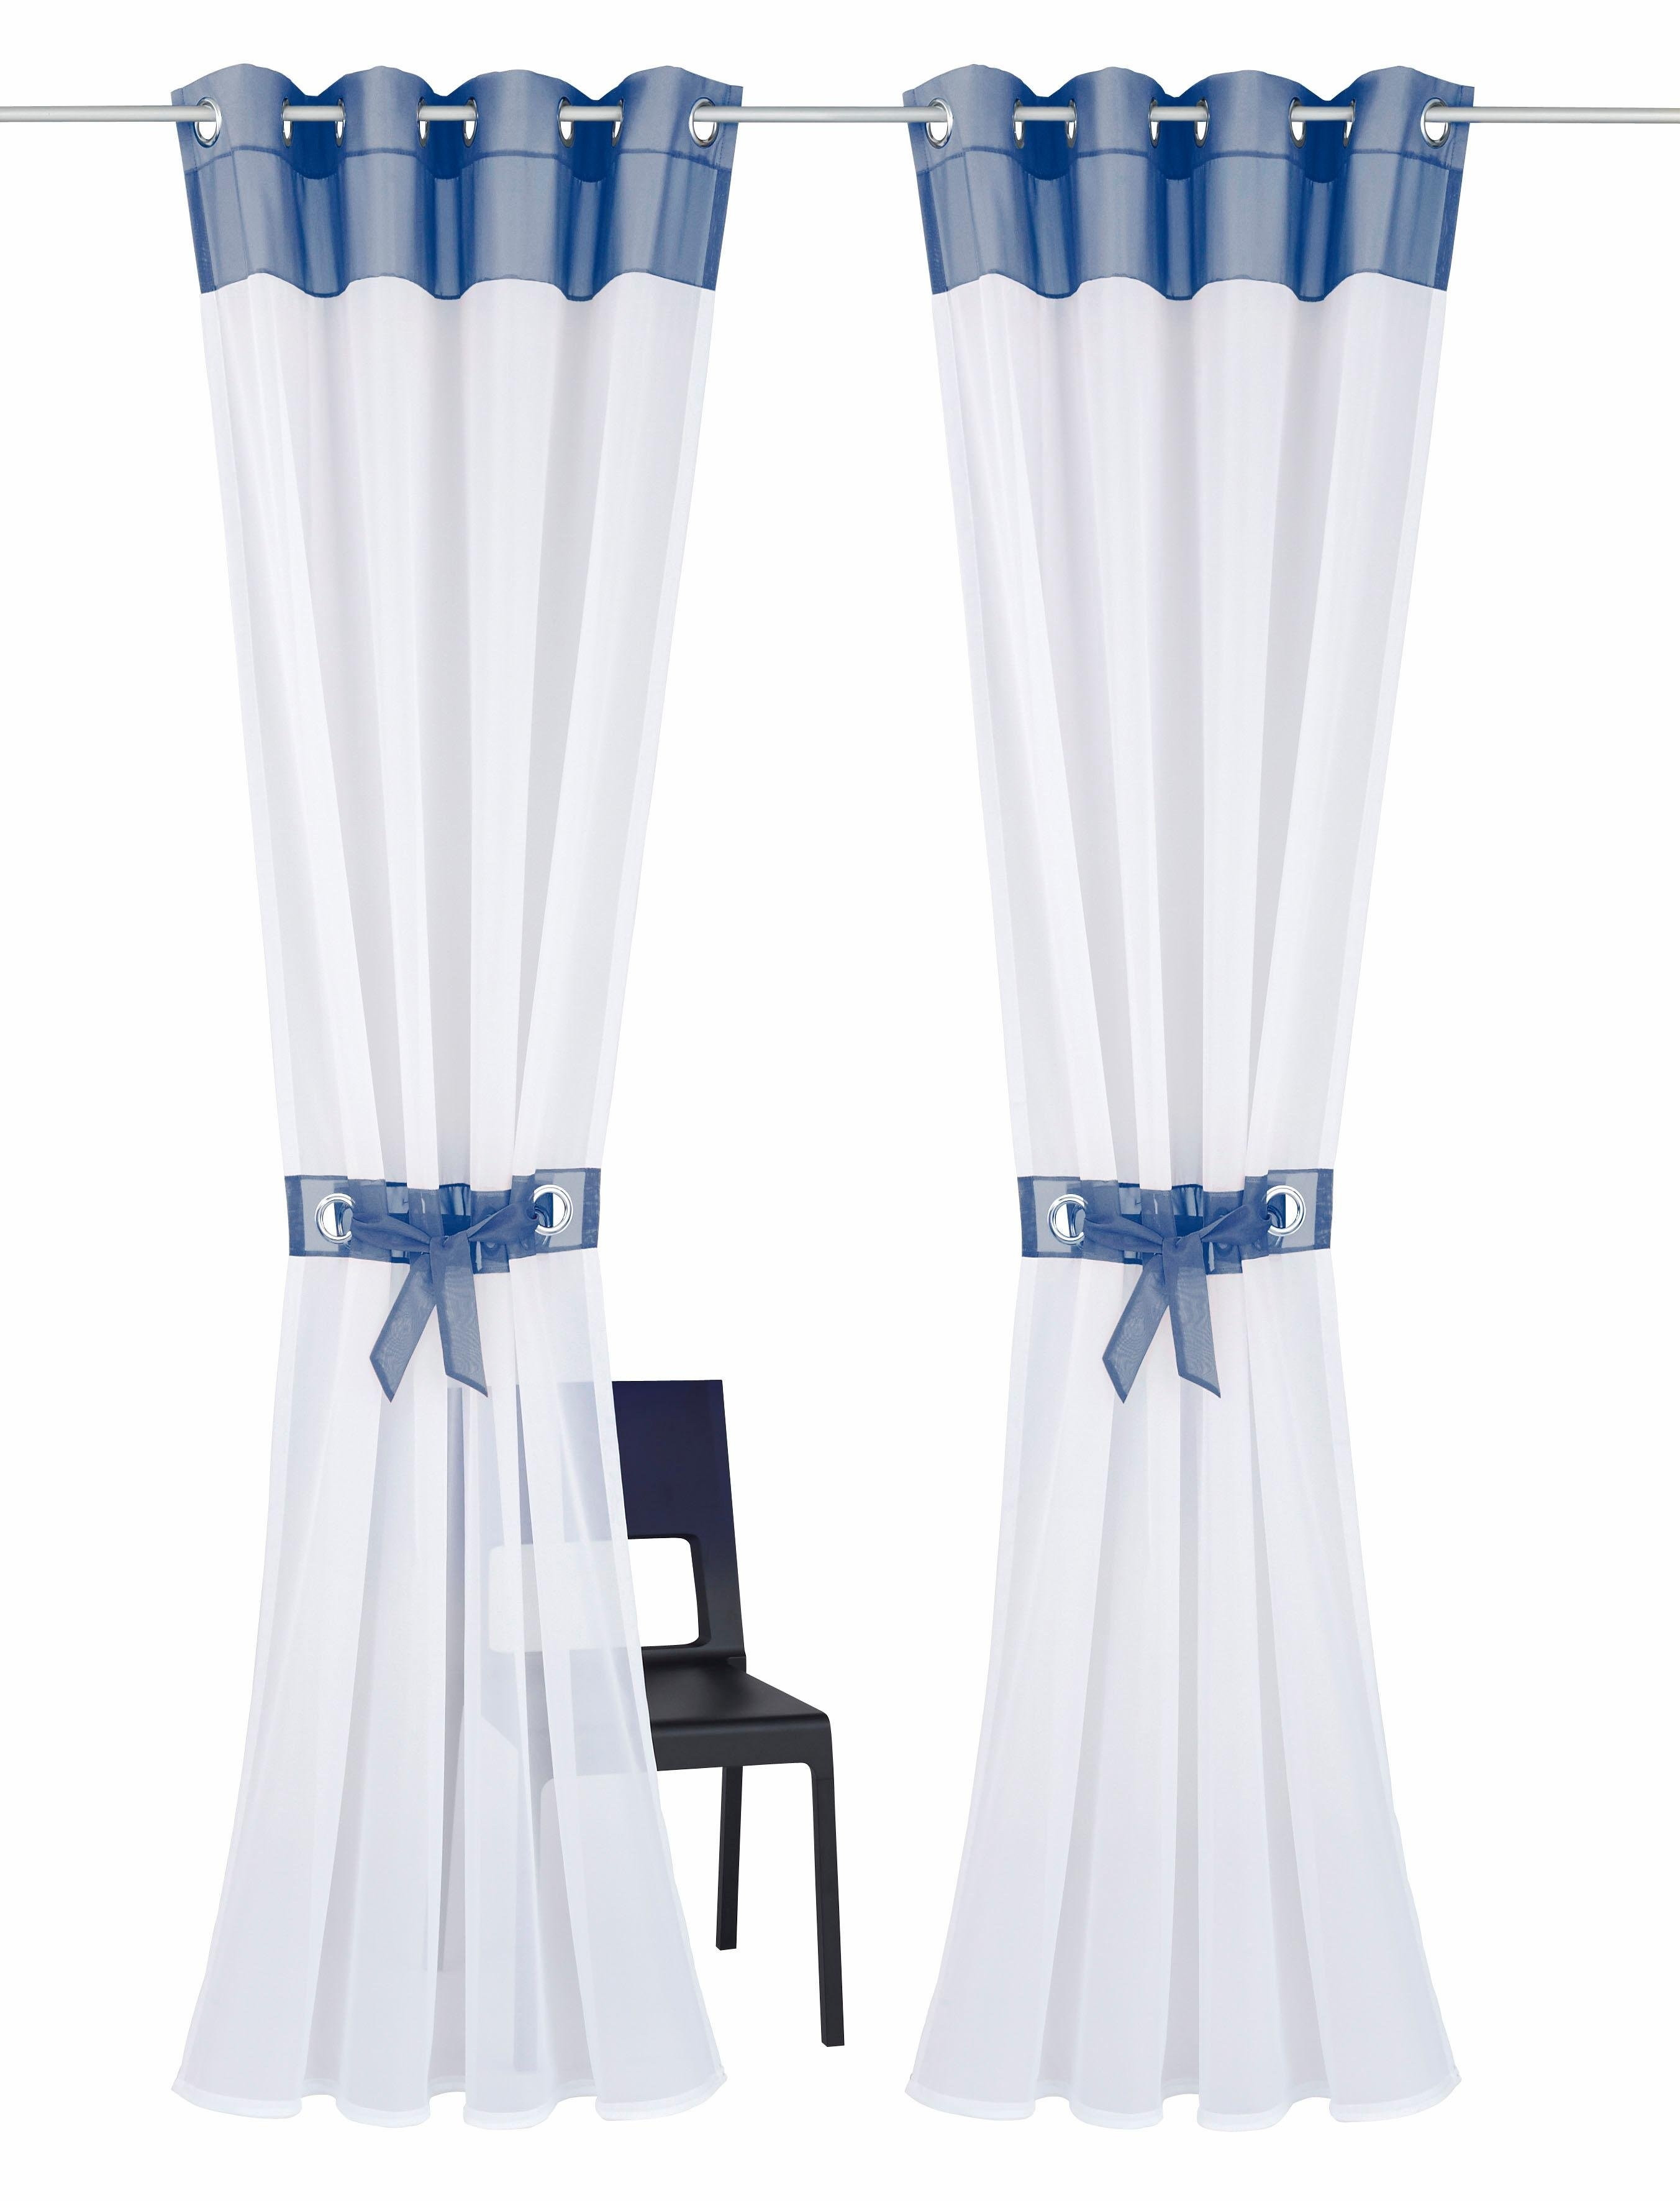 https://i.otto.nl/i/otto/17543648/my-home-gordijn-villars-in-set-van-2-blauw.jpg?$ovnl_seo_index$